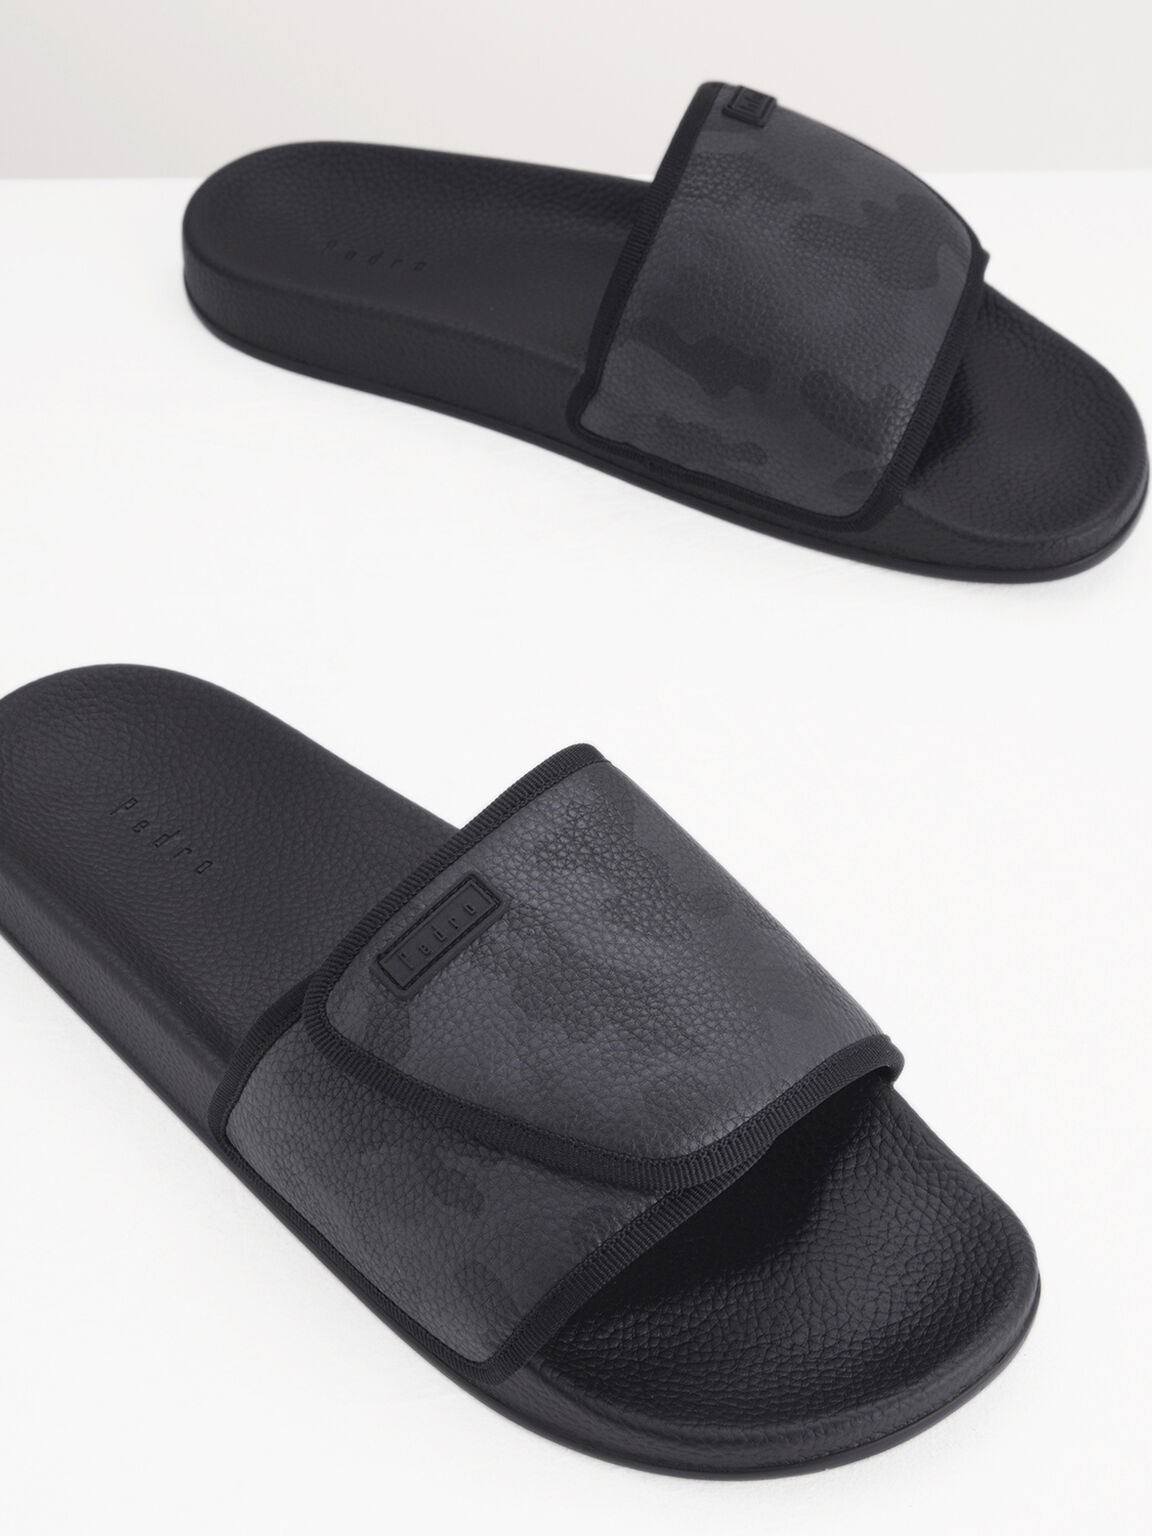 Camo-Effect Sliders, Black, hi-res